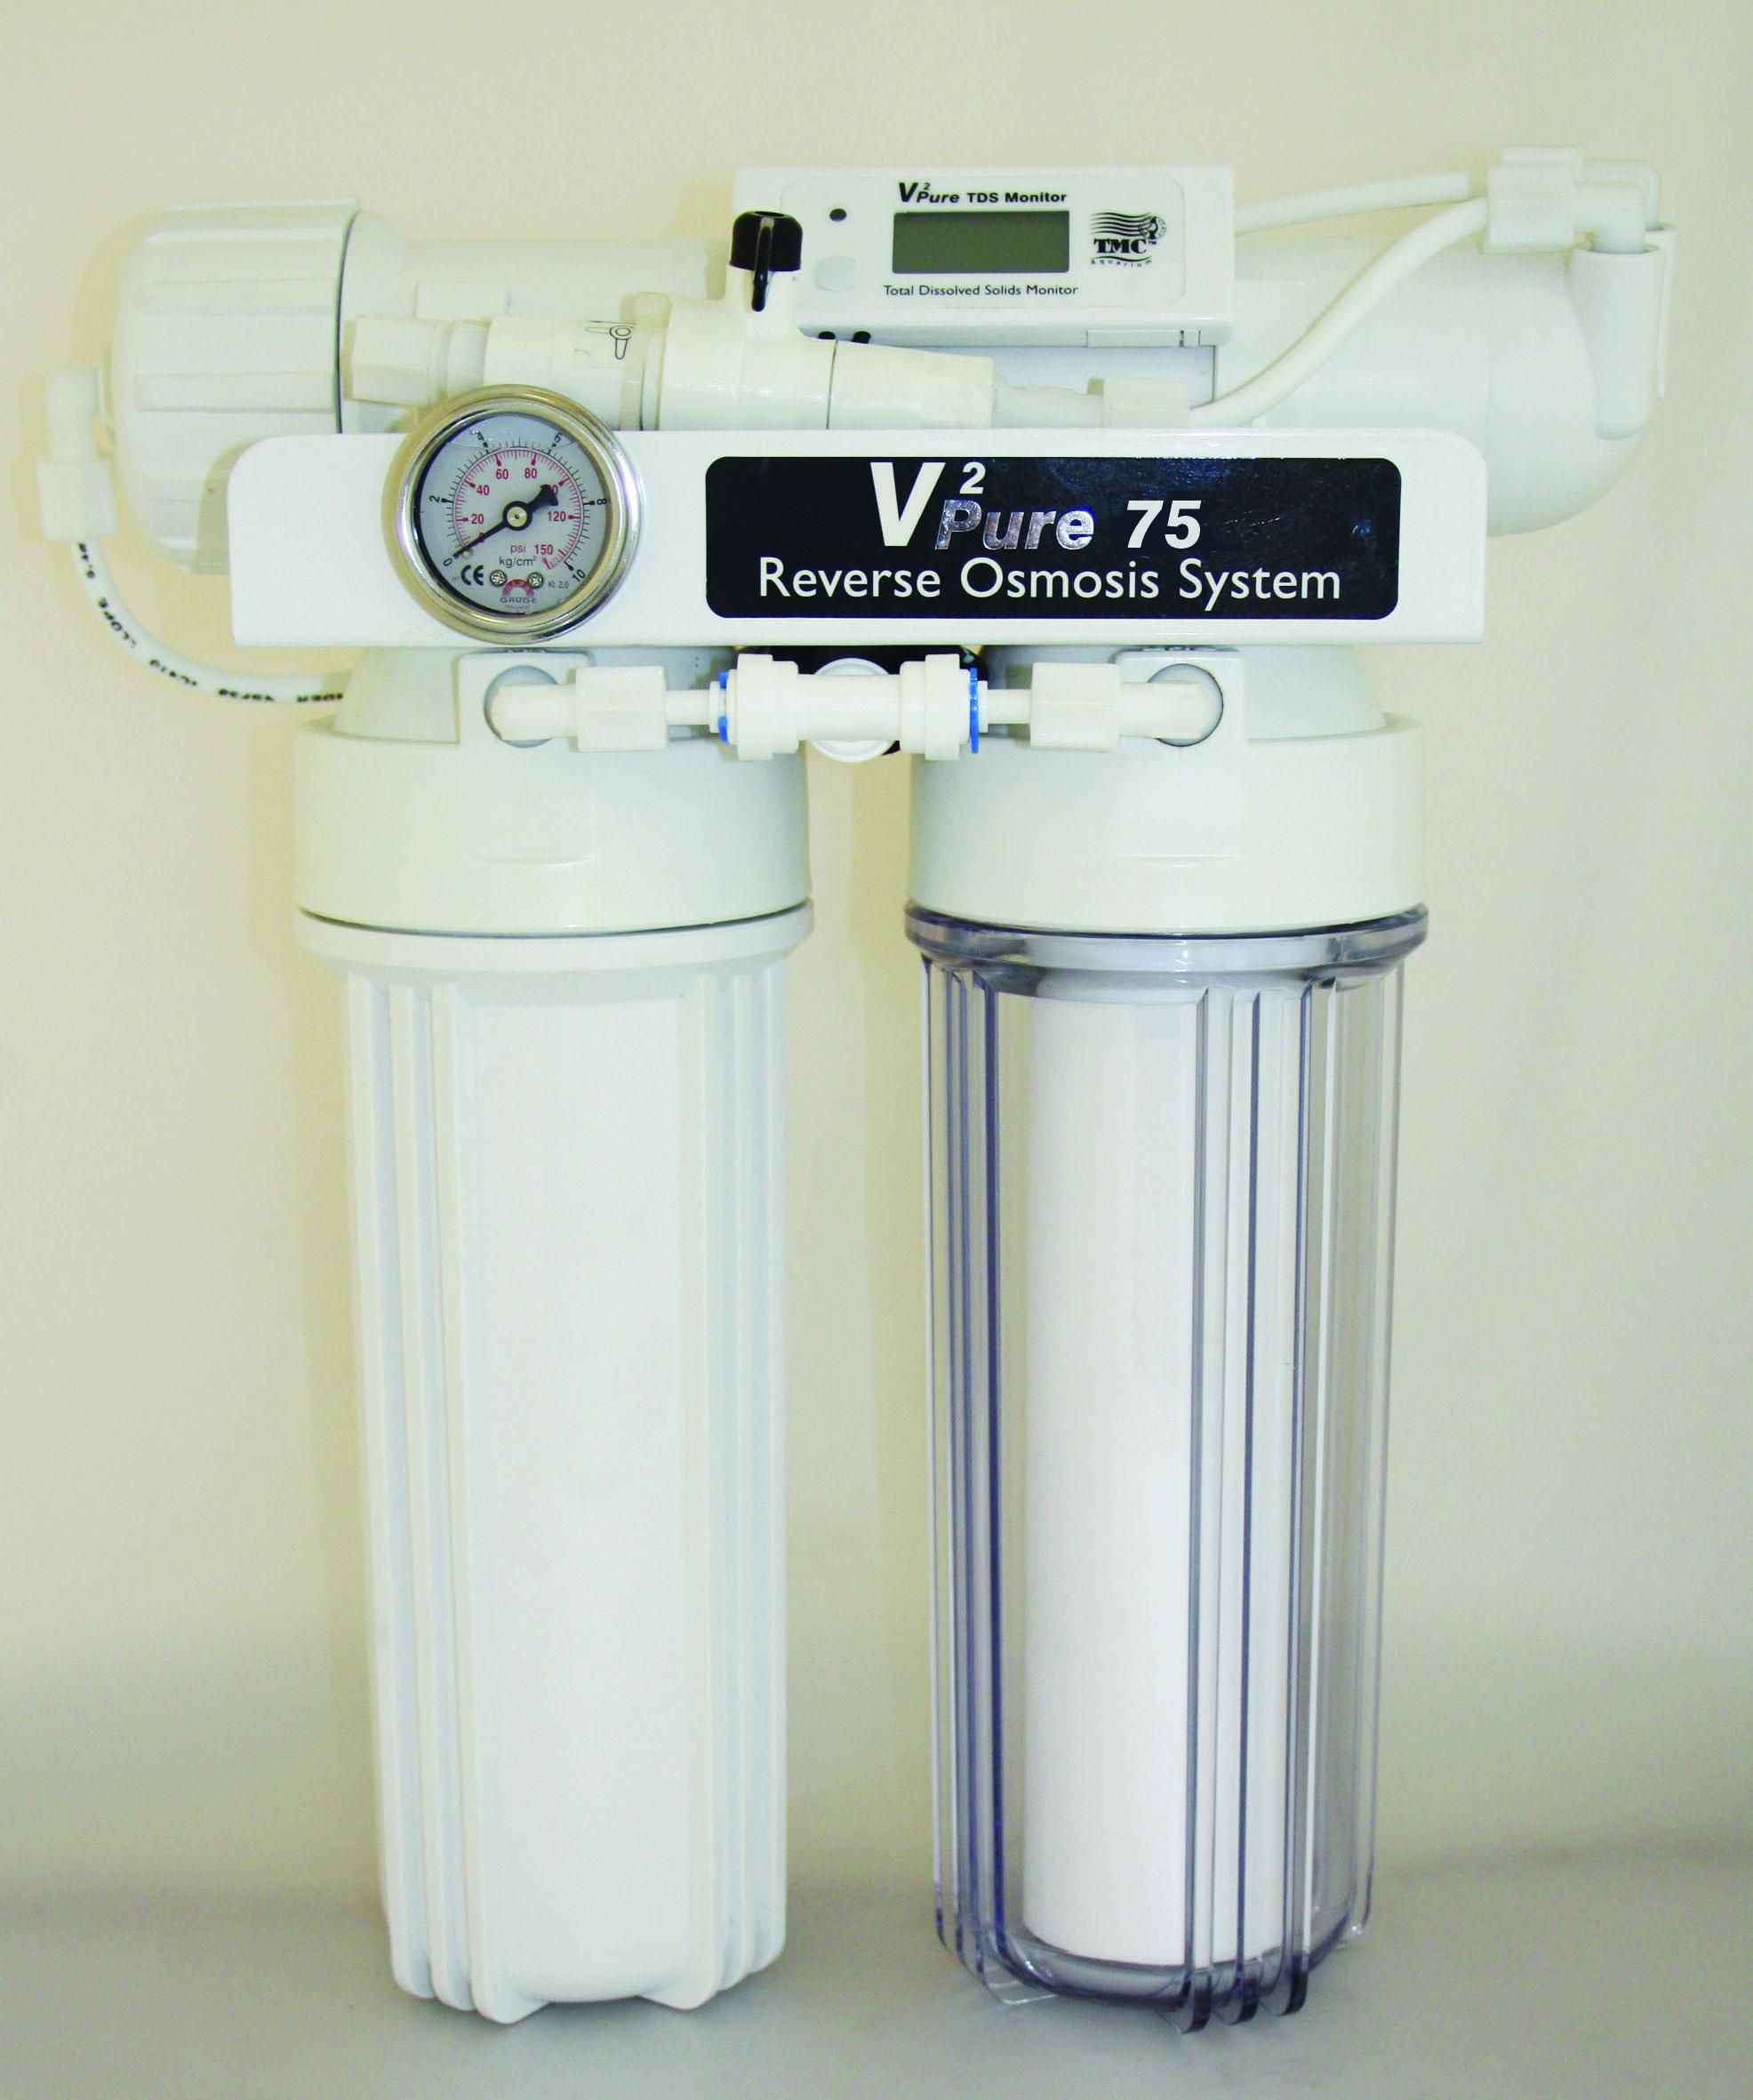 V2Pure 75 Advanced Ro Unit